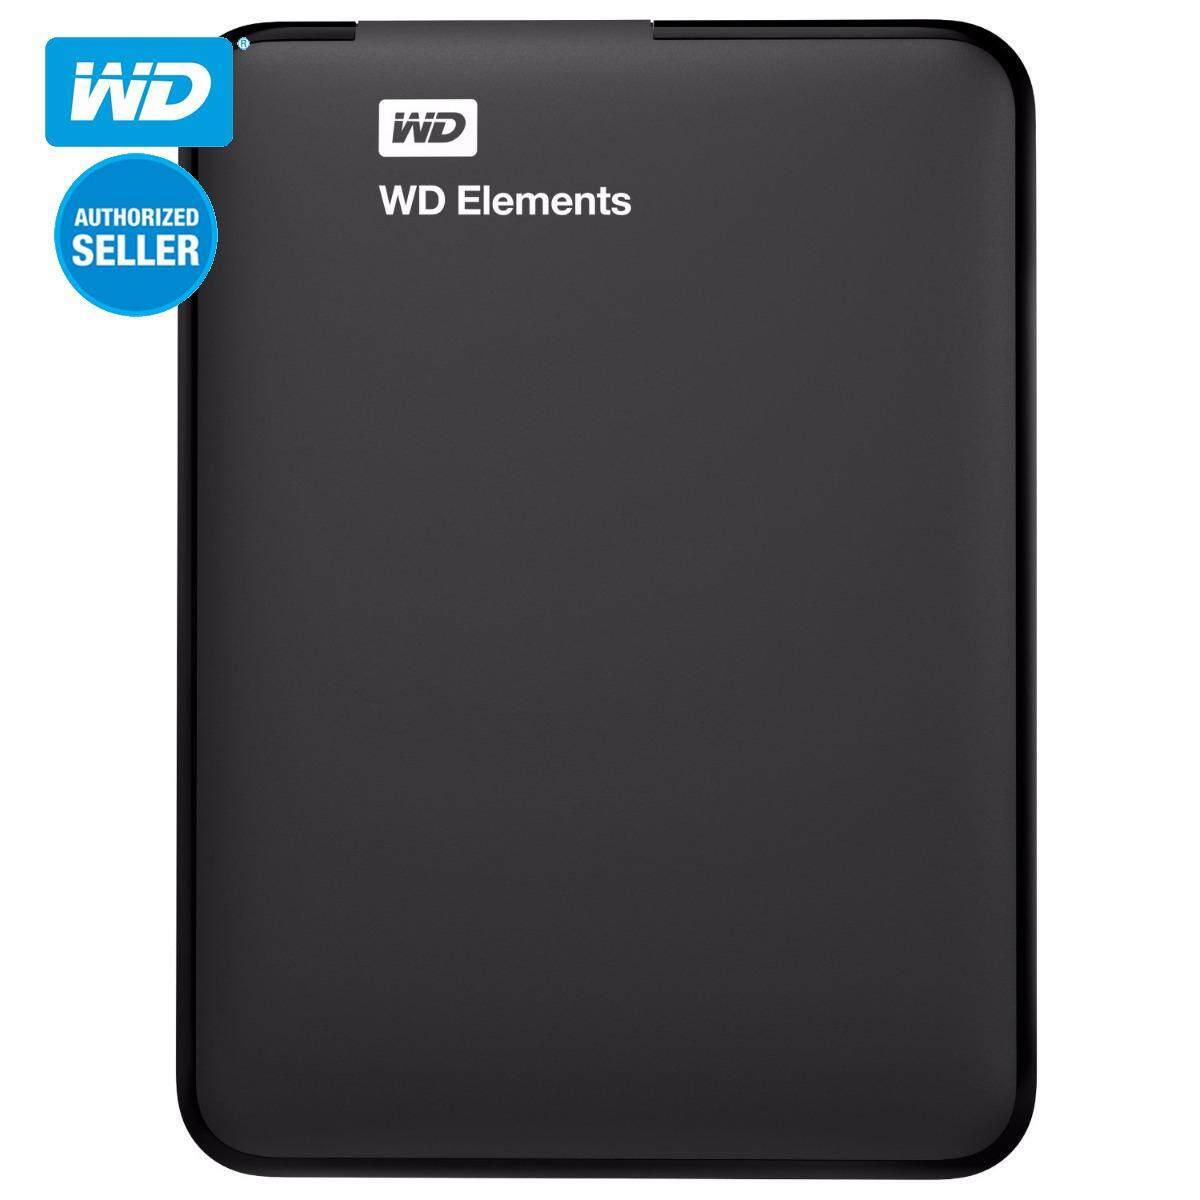 Western Digital Elements 1TB Portable External Hard Disk USB 30